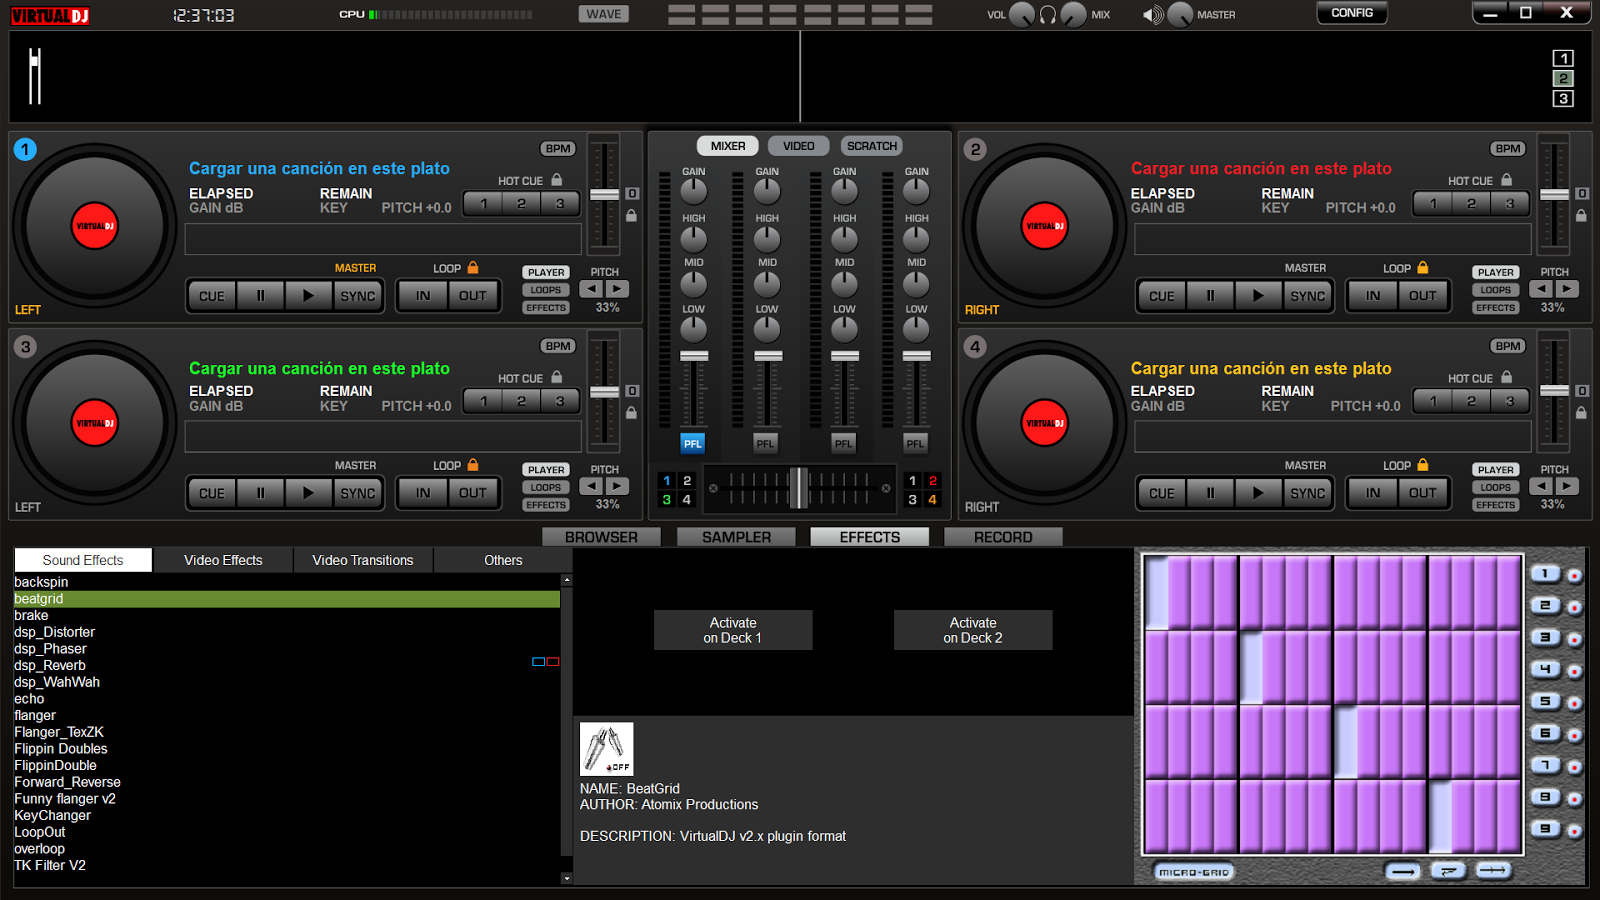 virtual dj pro 7.4.1 serial number